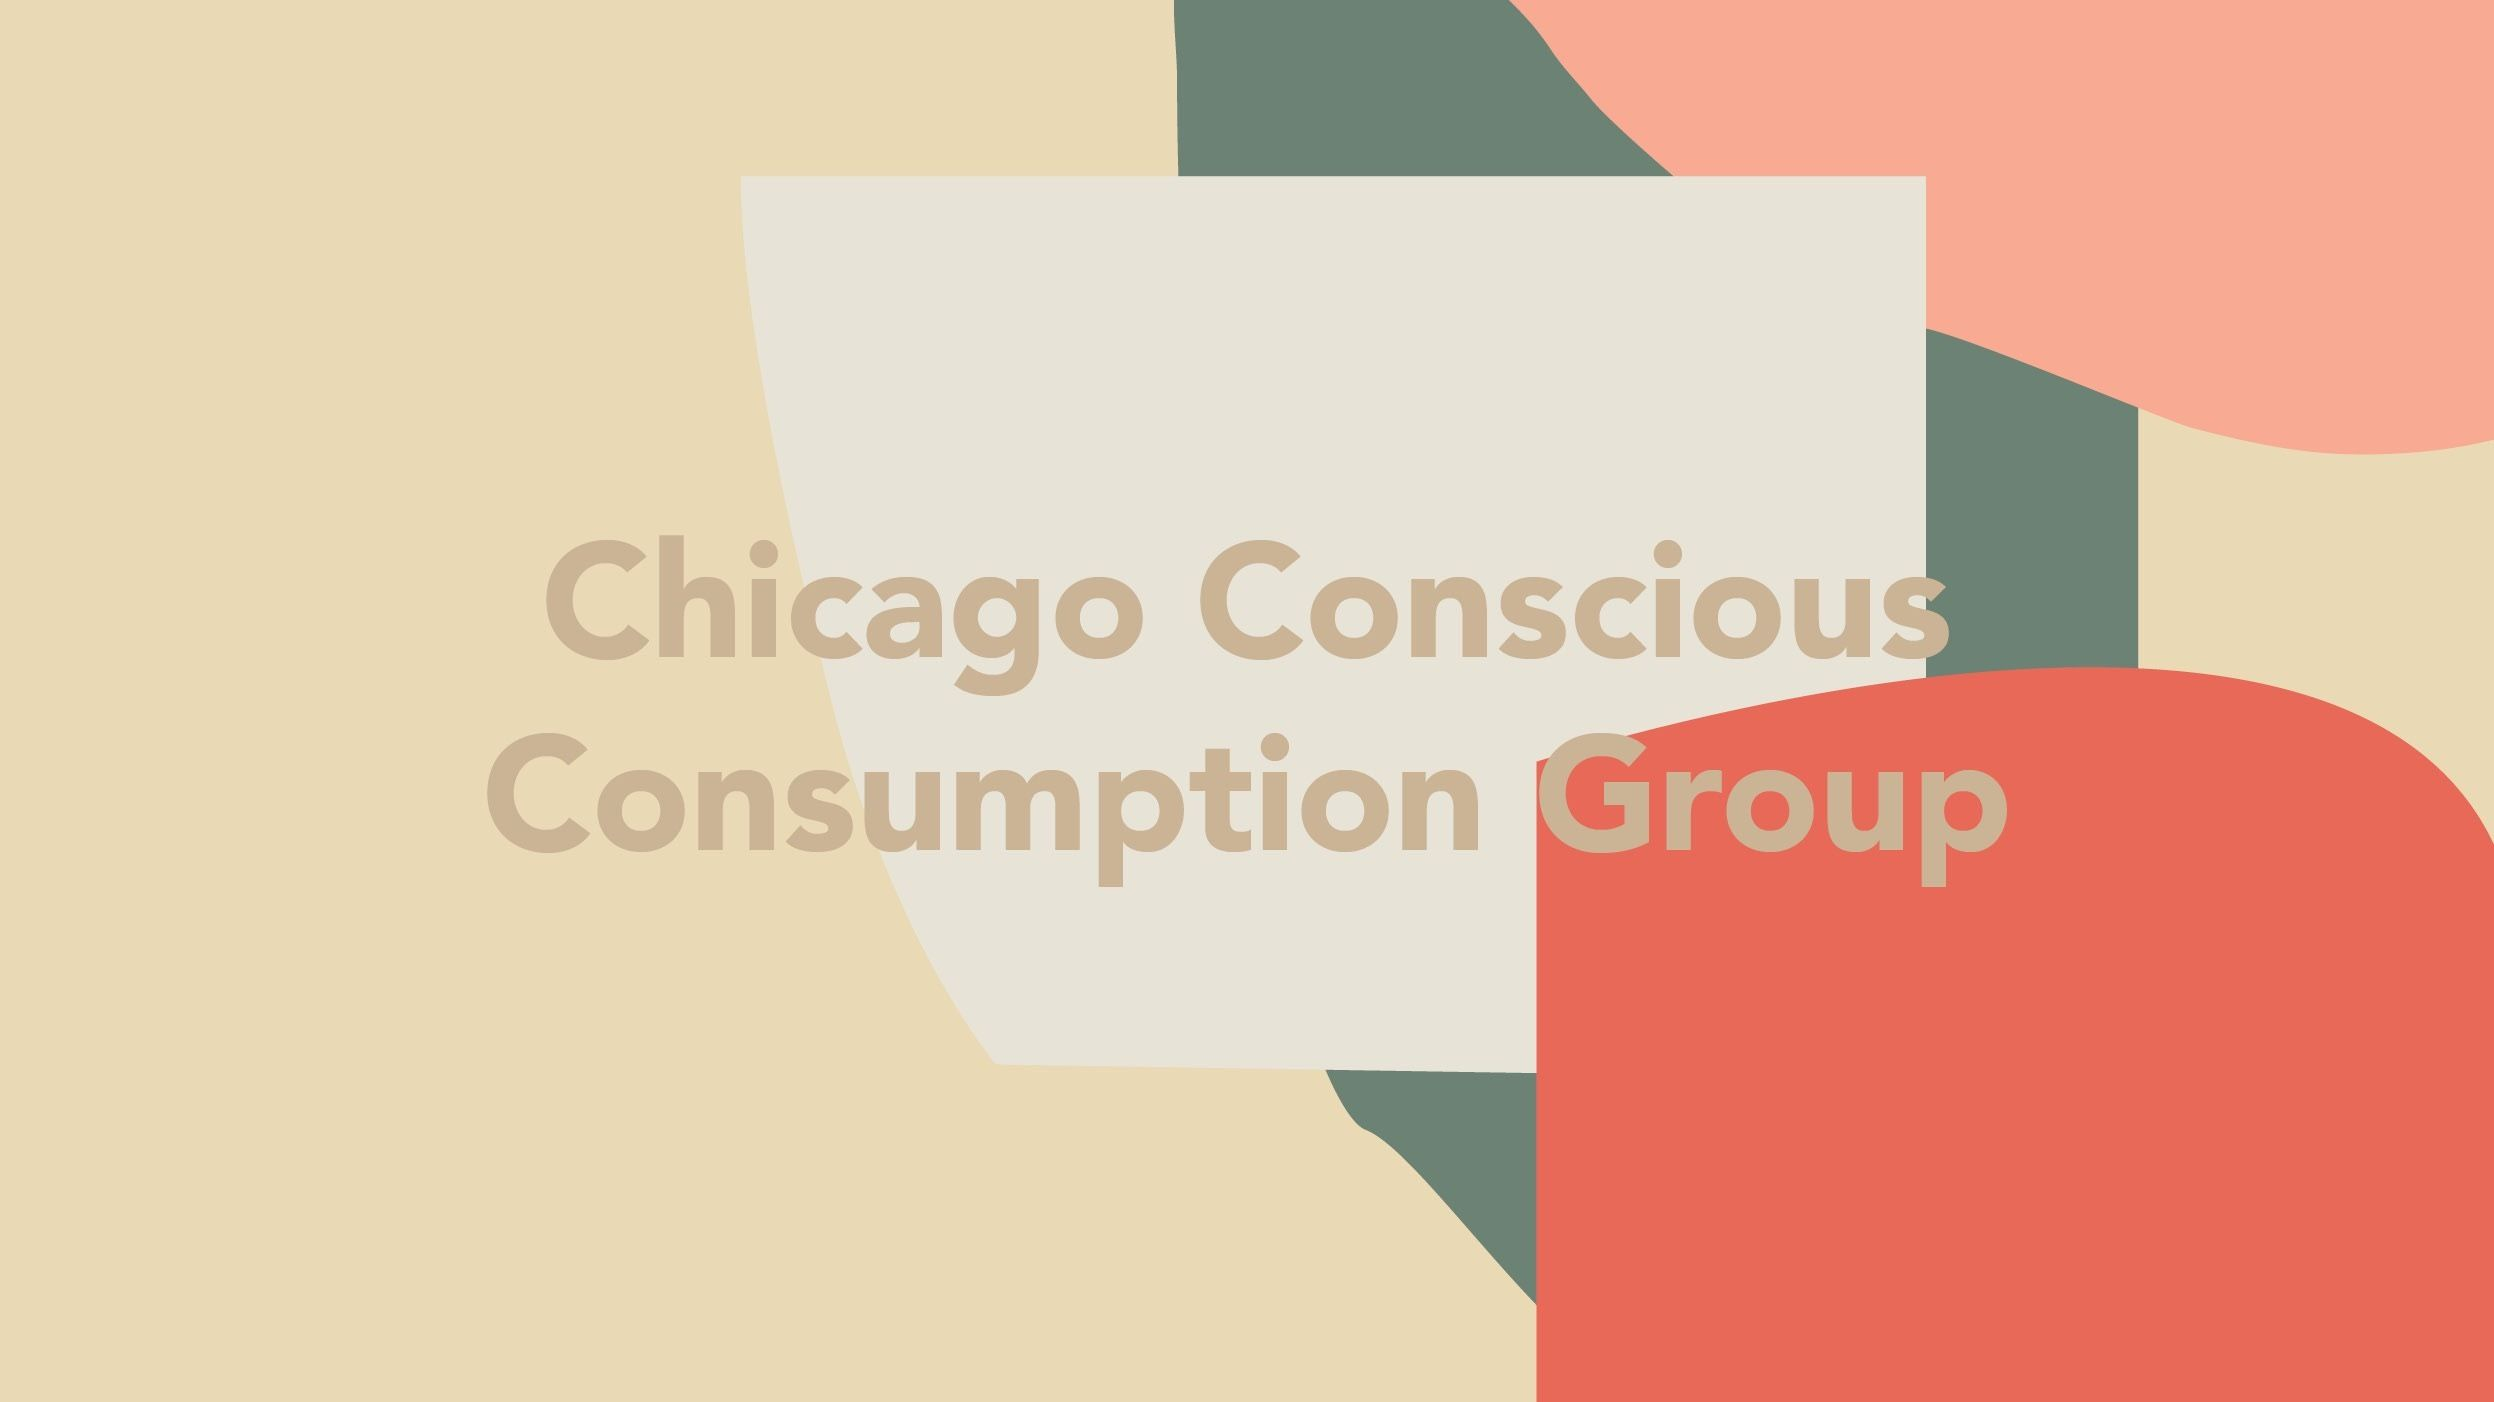 Chicago Conscious Consumption Group